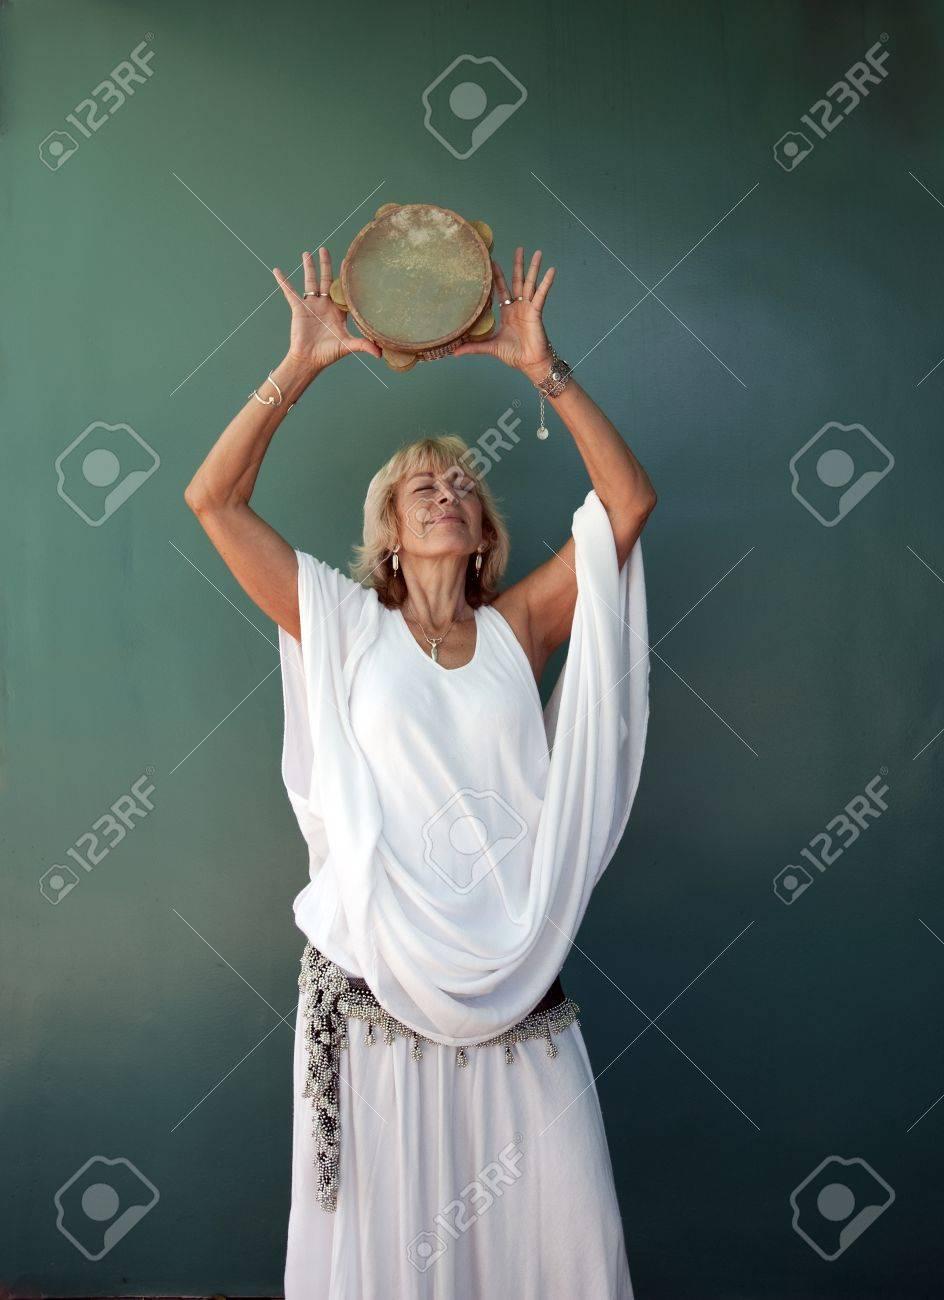 Woman in white raising a tamborine over her head. - 9189851